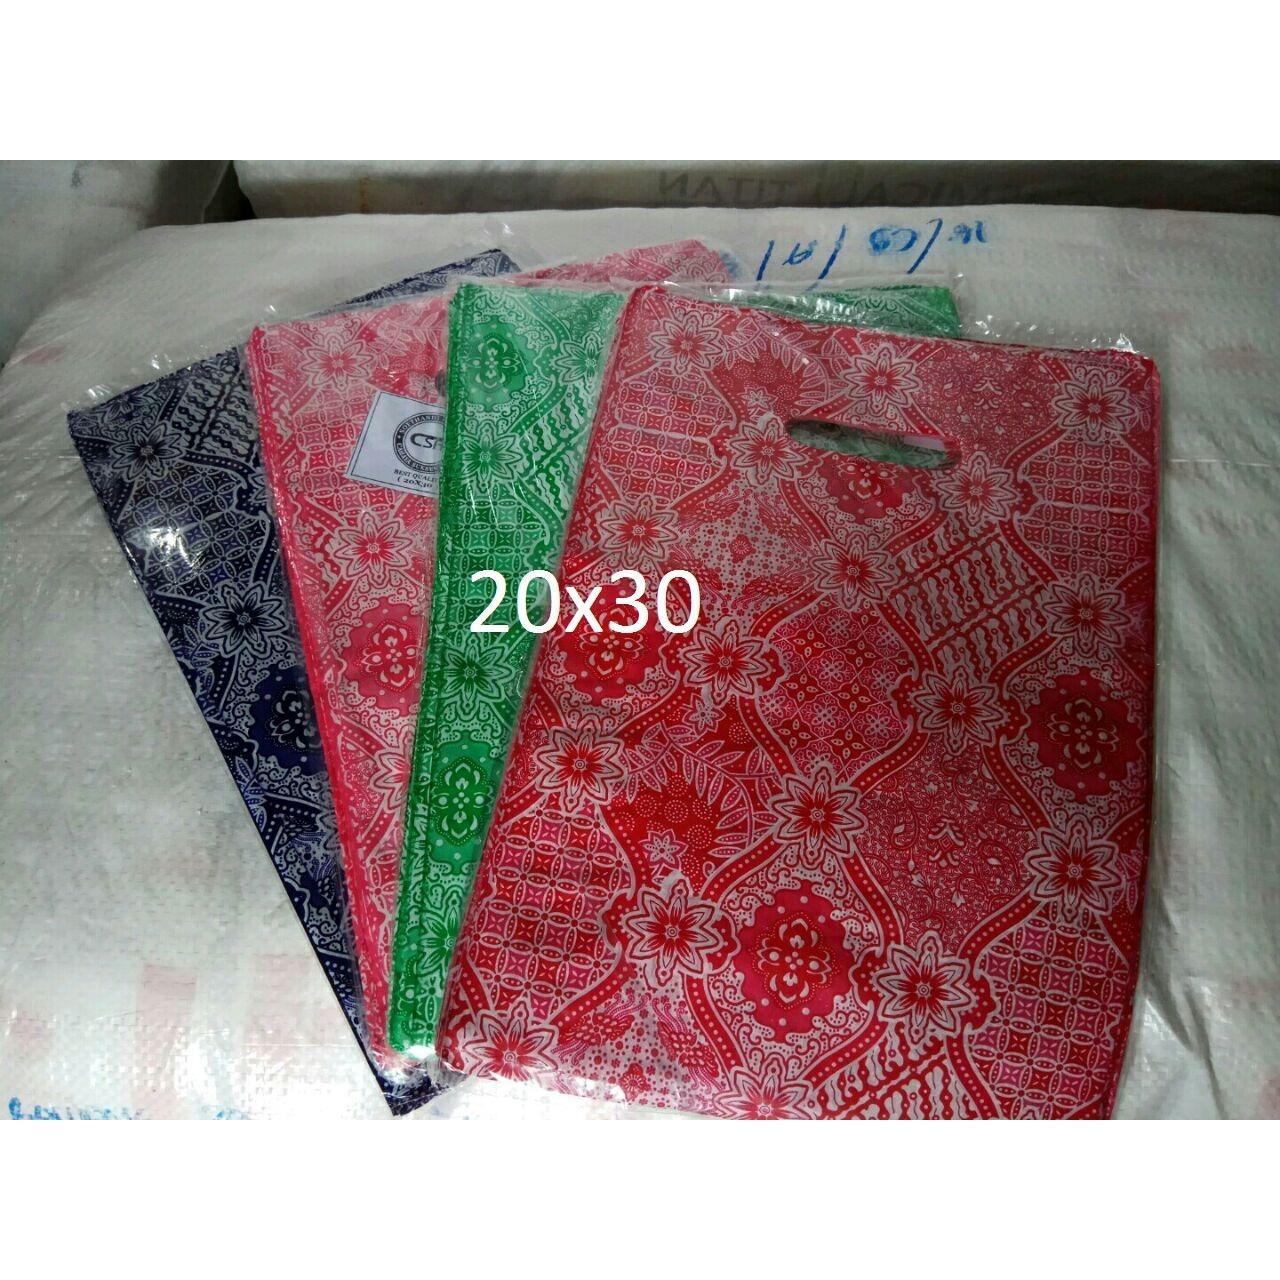 Kantong Plastik Baju HD Oval Batik Uk 20x30 - plastik belanja, kantong online shop